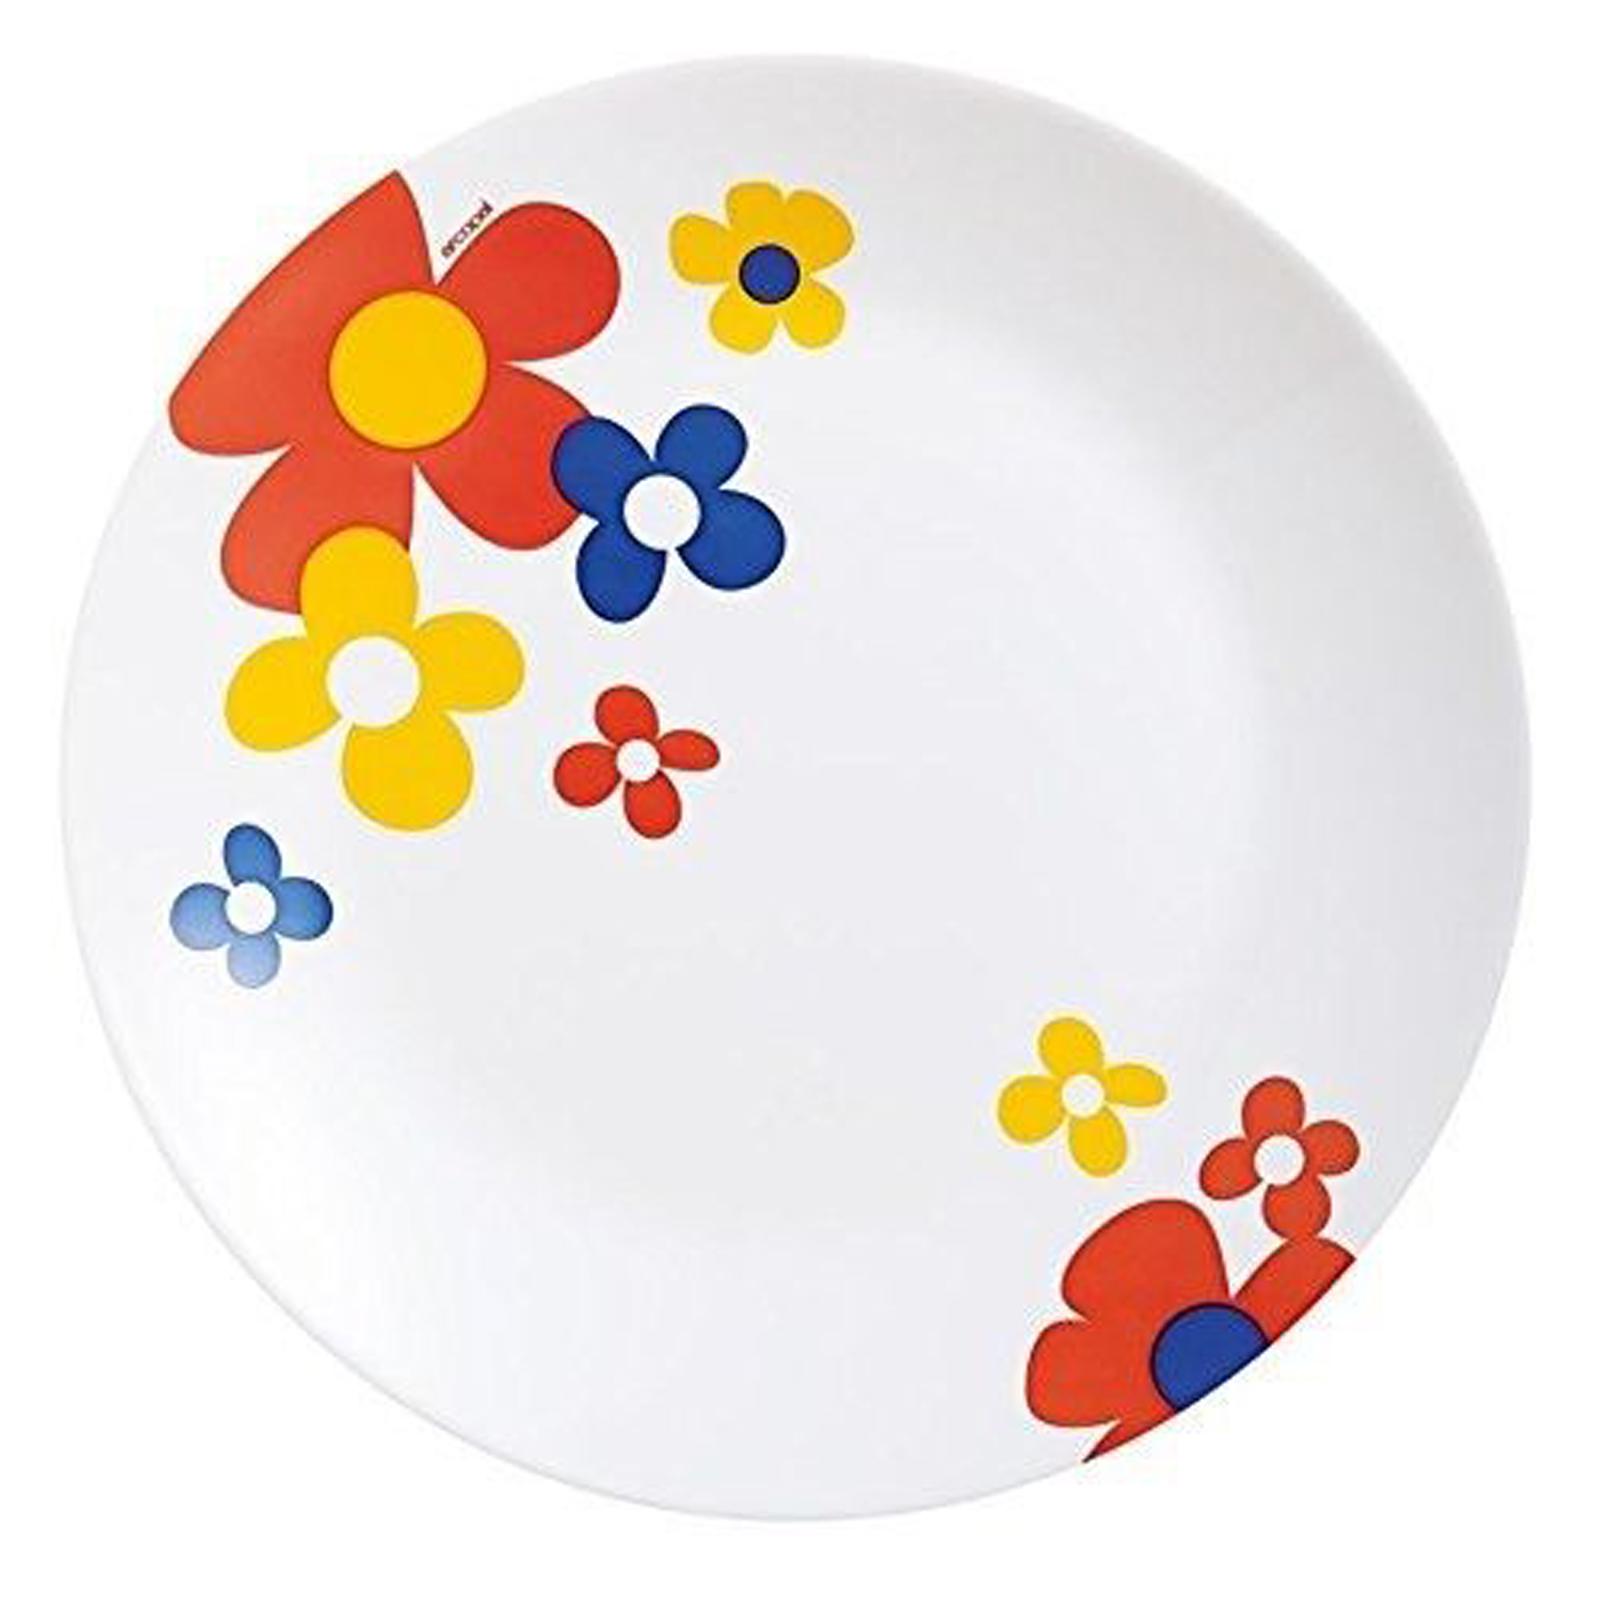 Servizio piatti da tavola in arcopal pz 18 celestine - Servizio piatti da tavola in arcopal pz 18 prometeo ...